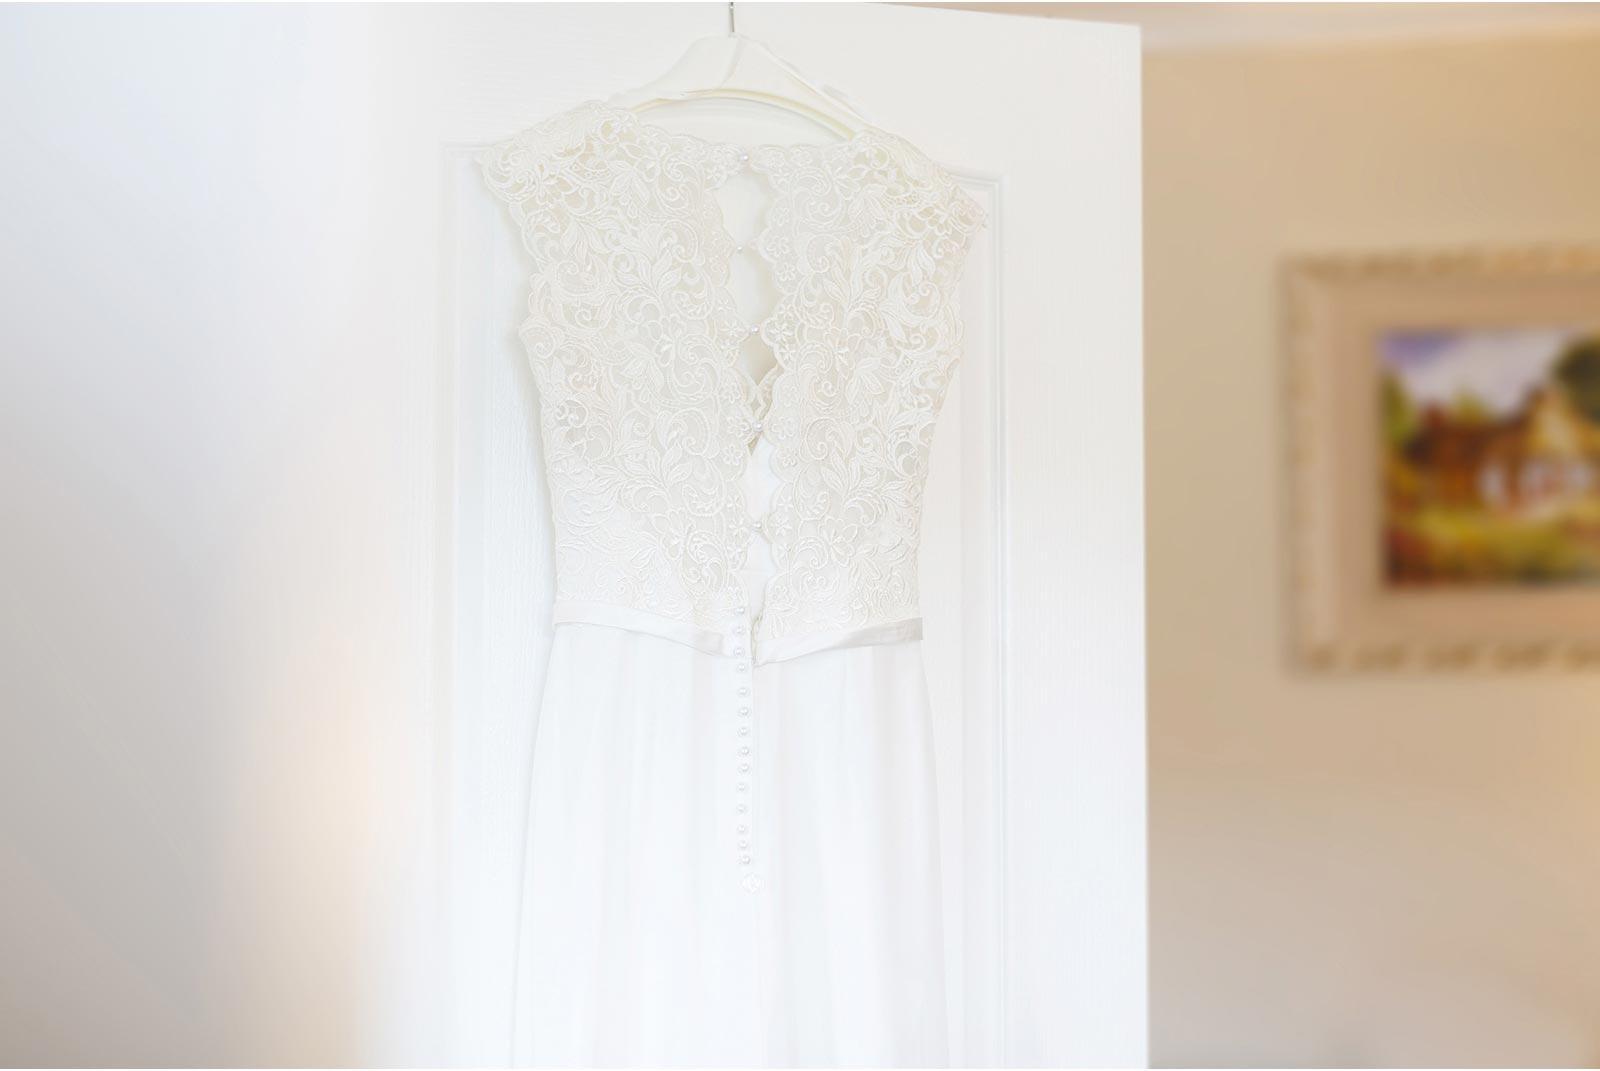 Bridal Bliss wedding dress, Cork wedding dress, Kingsley hotel